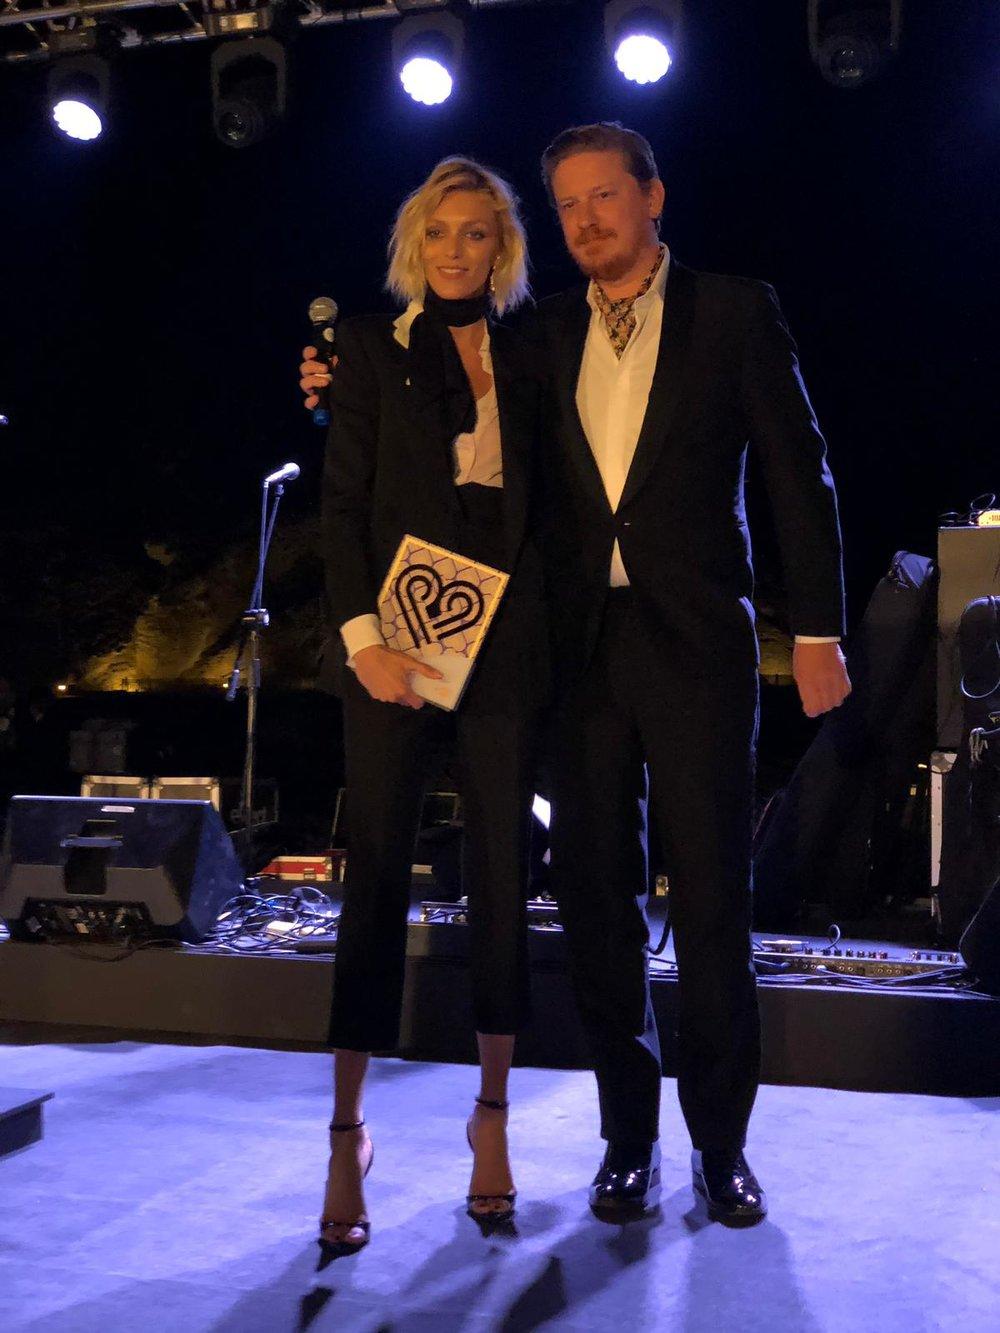 Filip Niedenthal Editor in Chief Vogue Poland presents award to Anja Rubik.jpeg